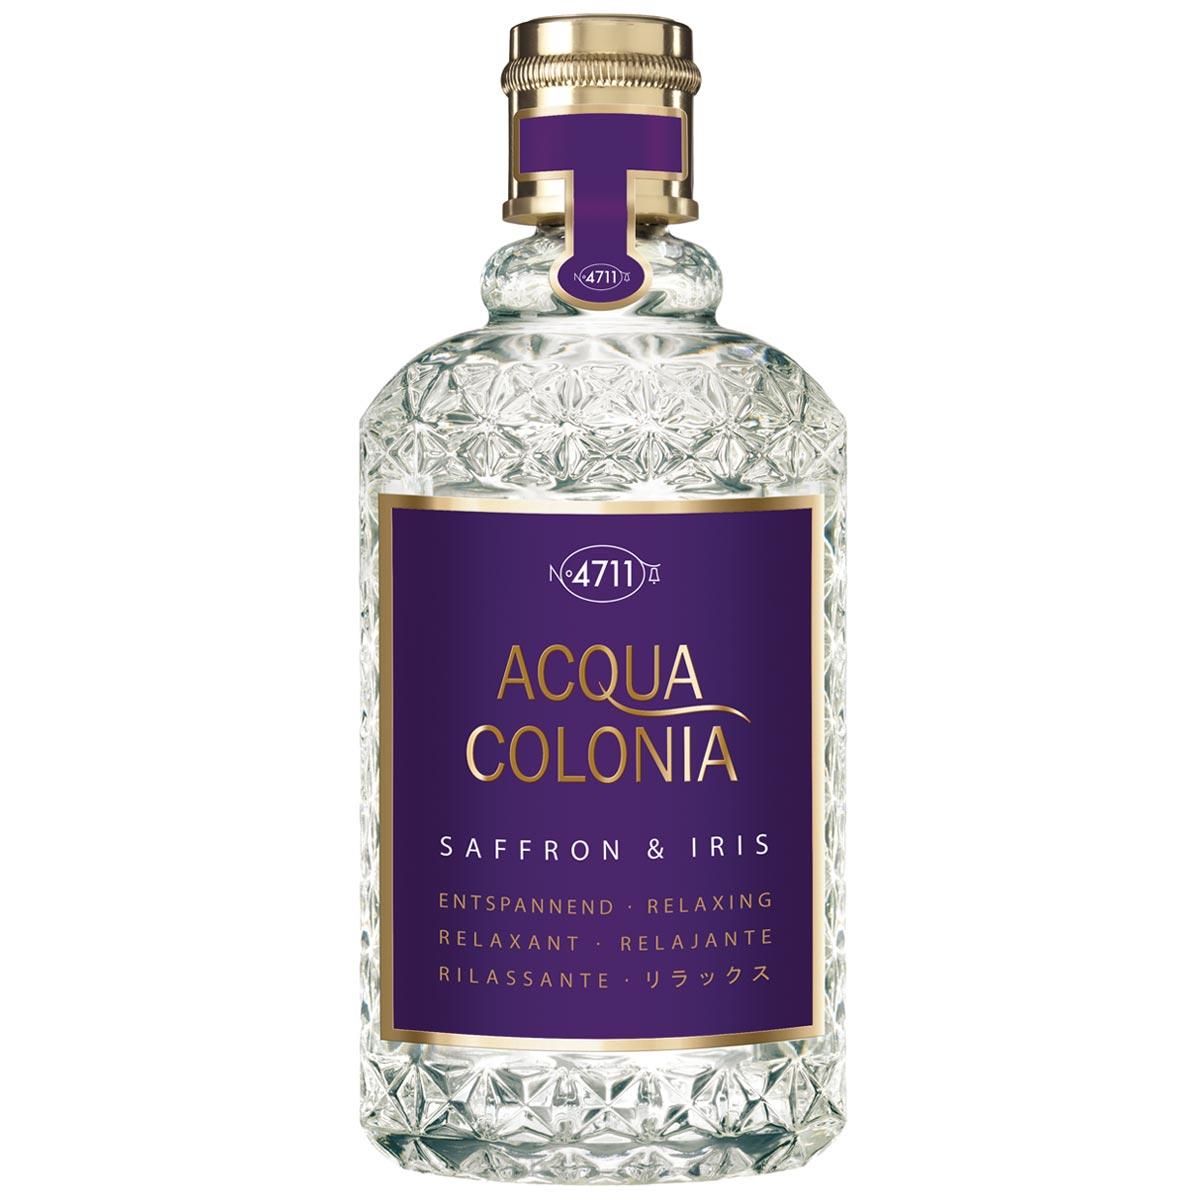 Eau de Cologne Acqua Colonia Safran & Iris - 4711